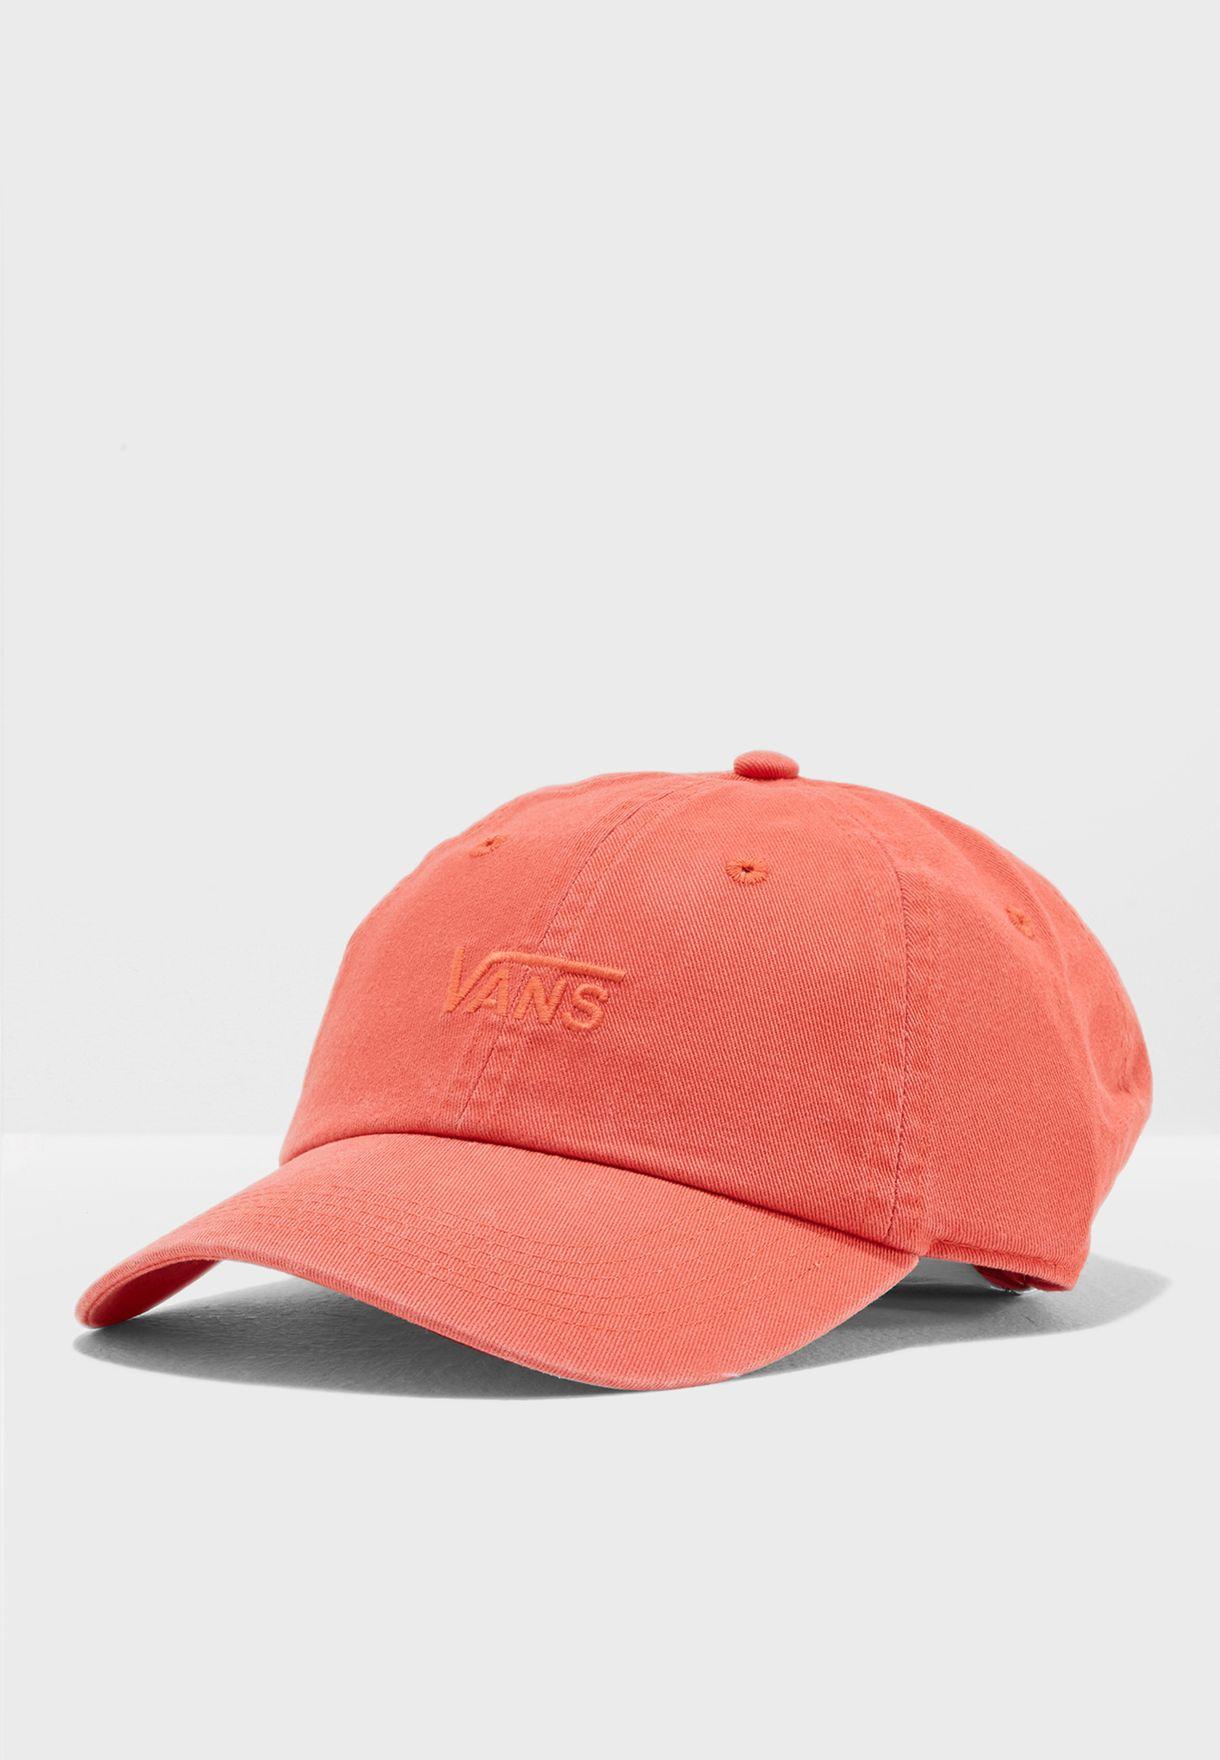 7341e49a71b Shop Vans orange Court Side Hat VA31T6P37 for Women in UAE ...